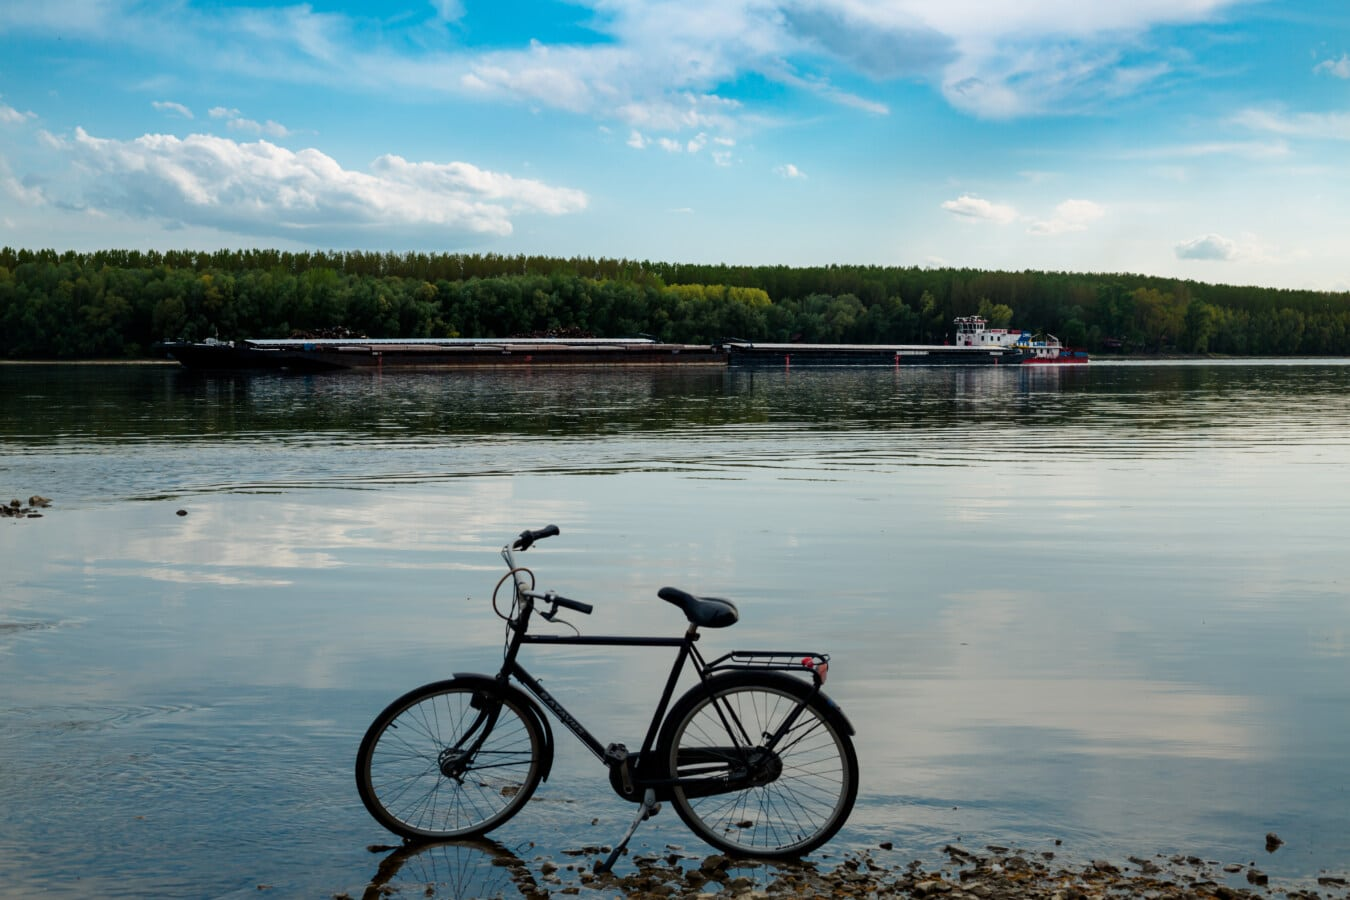 Lastkahn, Frachtschiff, Transport, Fluss, Danube, Fahrrad, Flussufer, Wasser, Reflexion, Rad